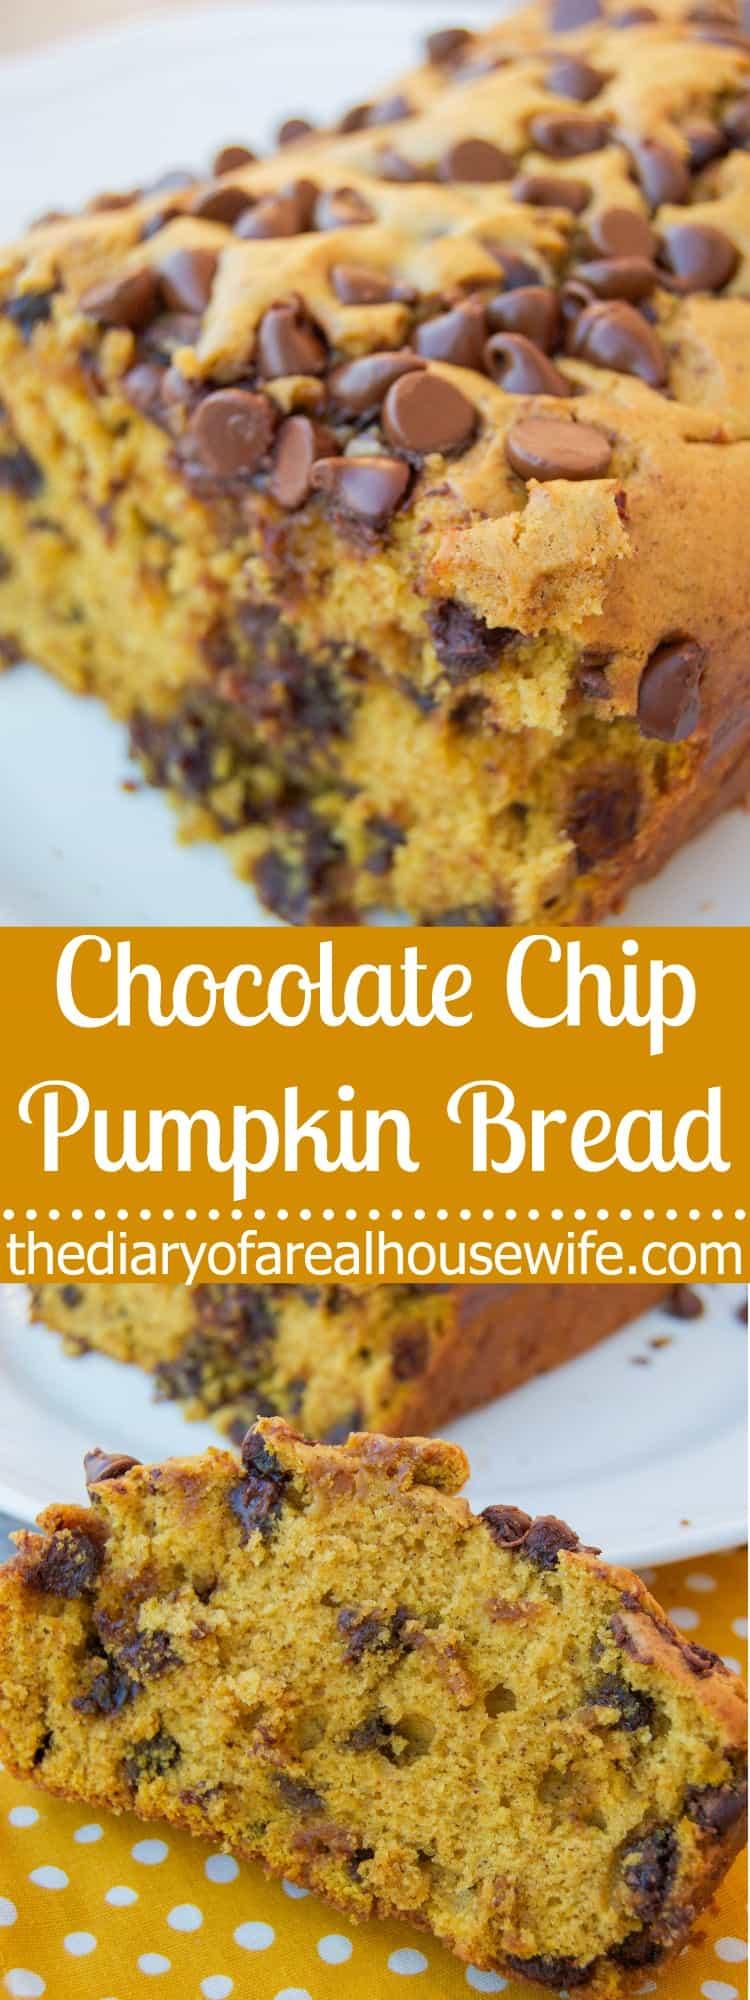 easy-chocolate-chip-pumpkin-bread